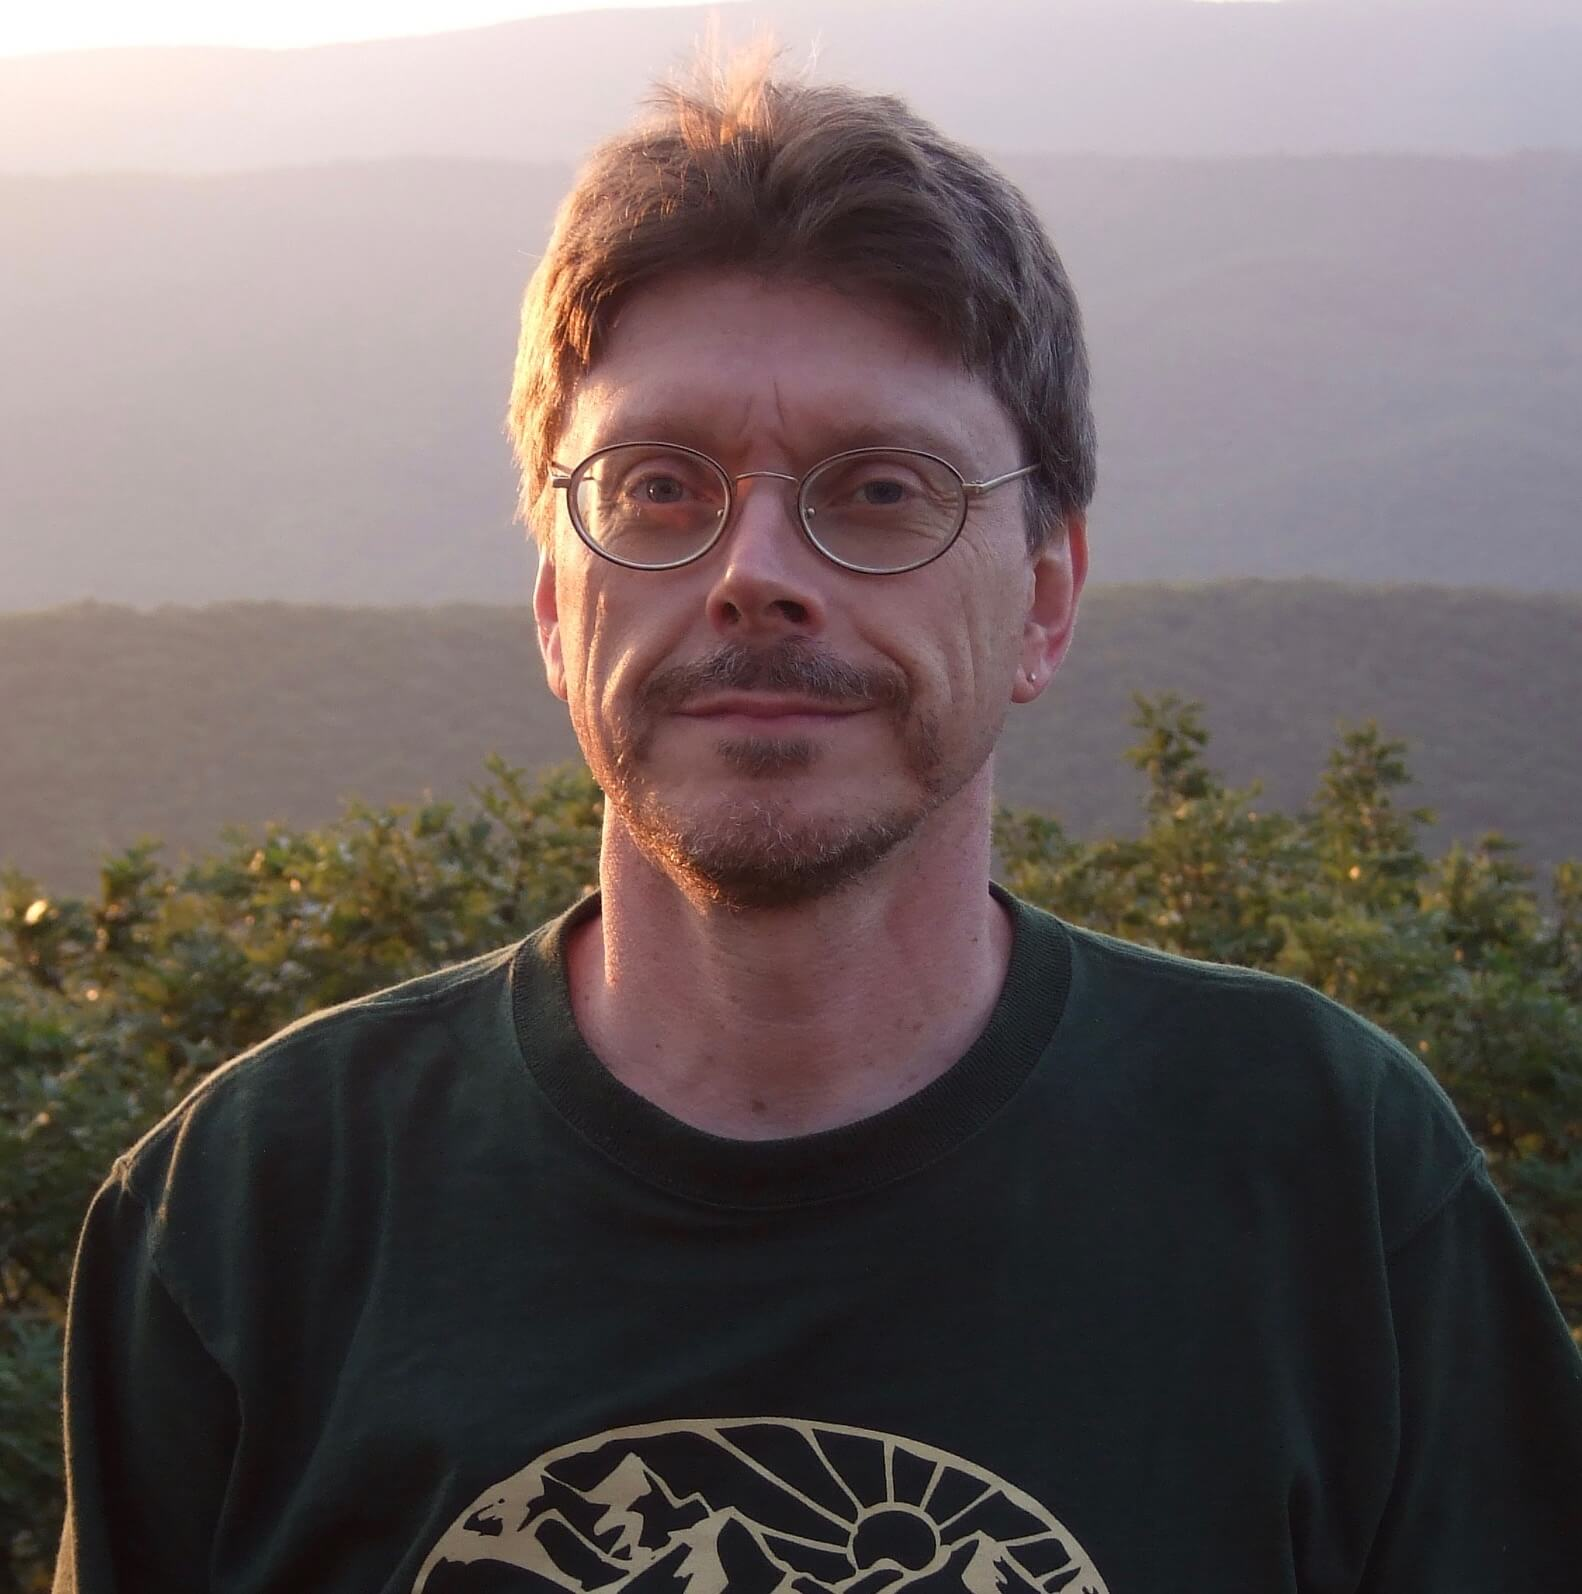 Bill Gupton